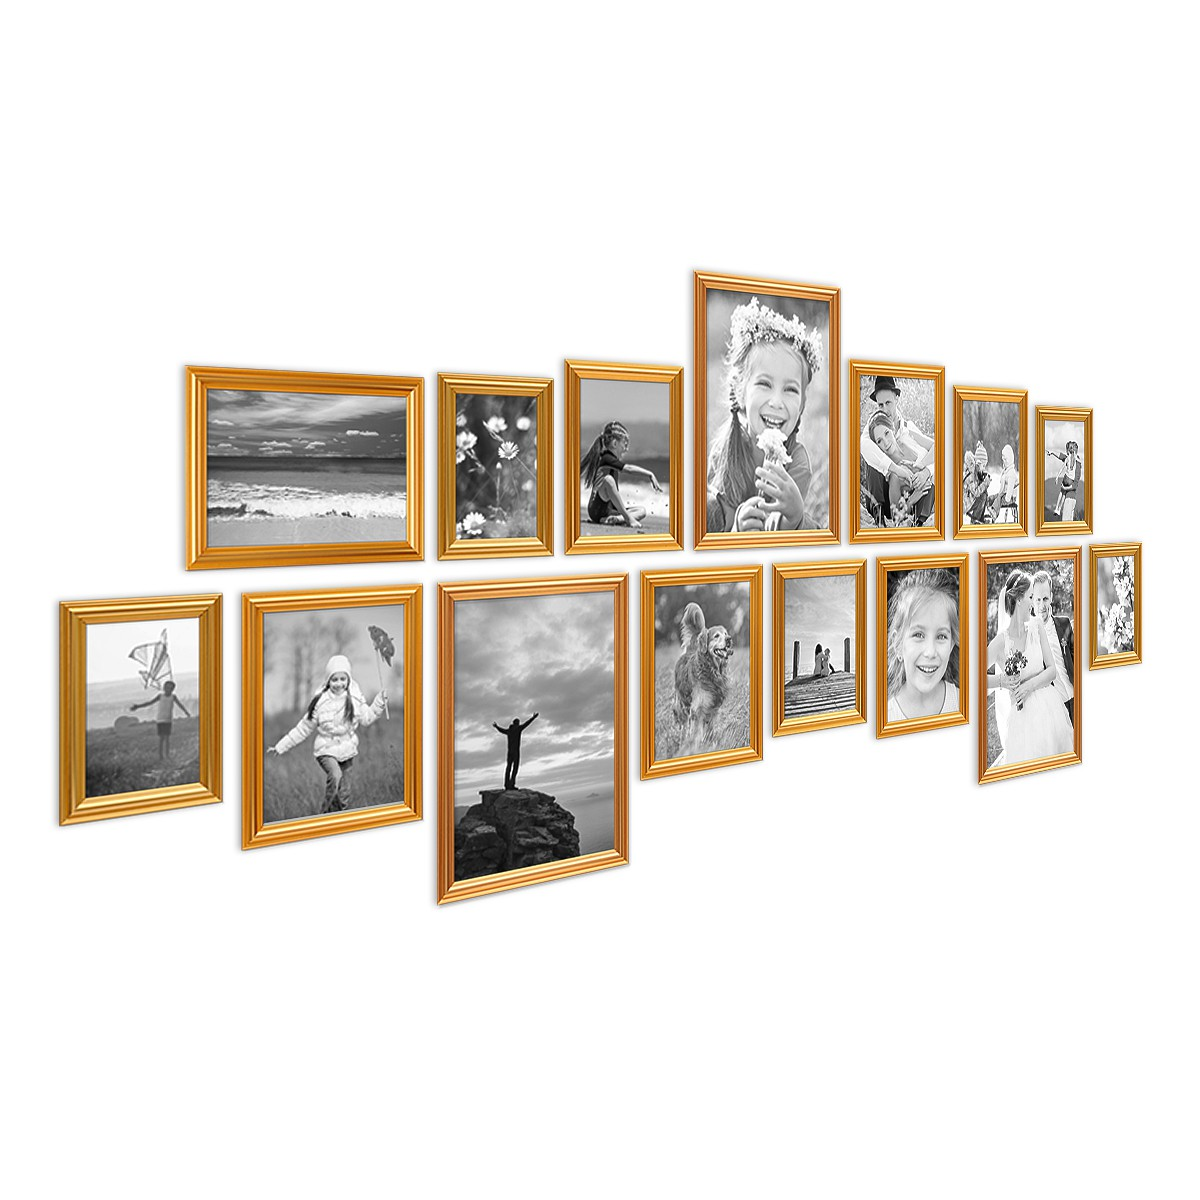 15er Bilderrahmen-Set Gold Barock Antik aus Kunststoff inklusive ...